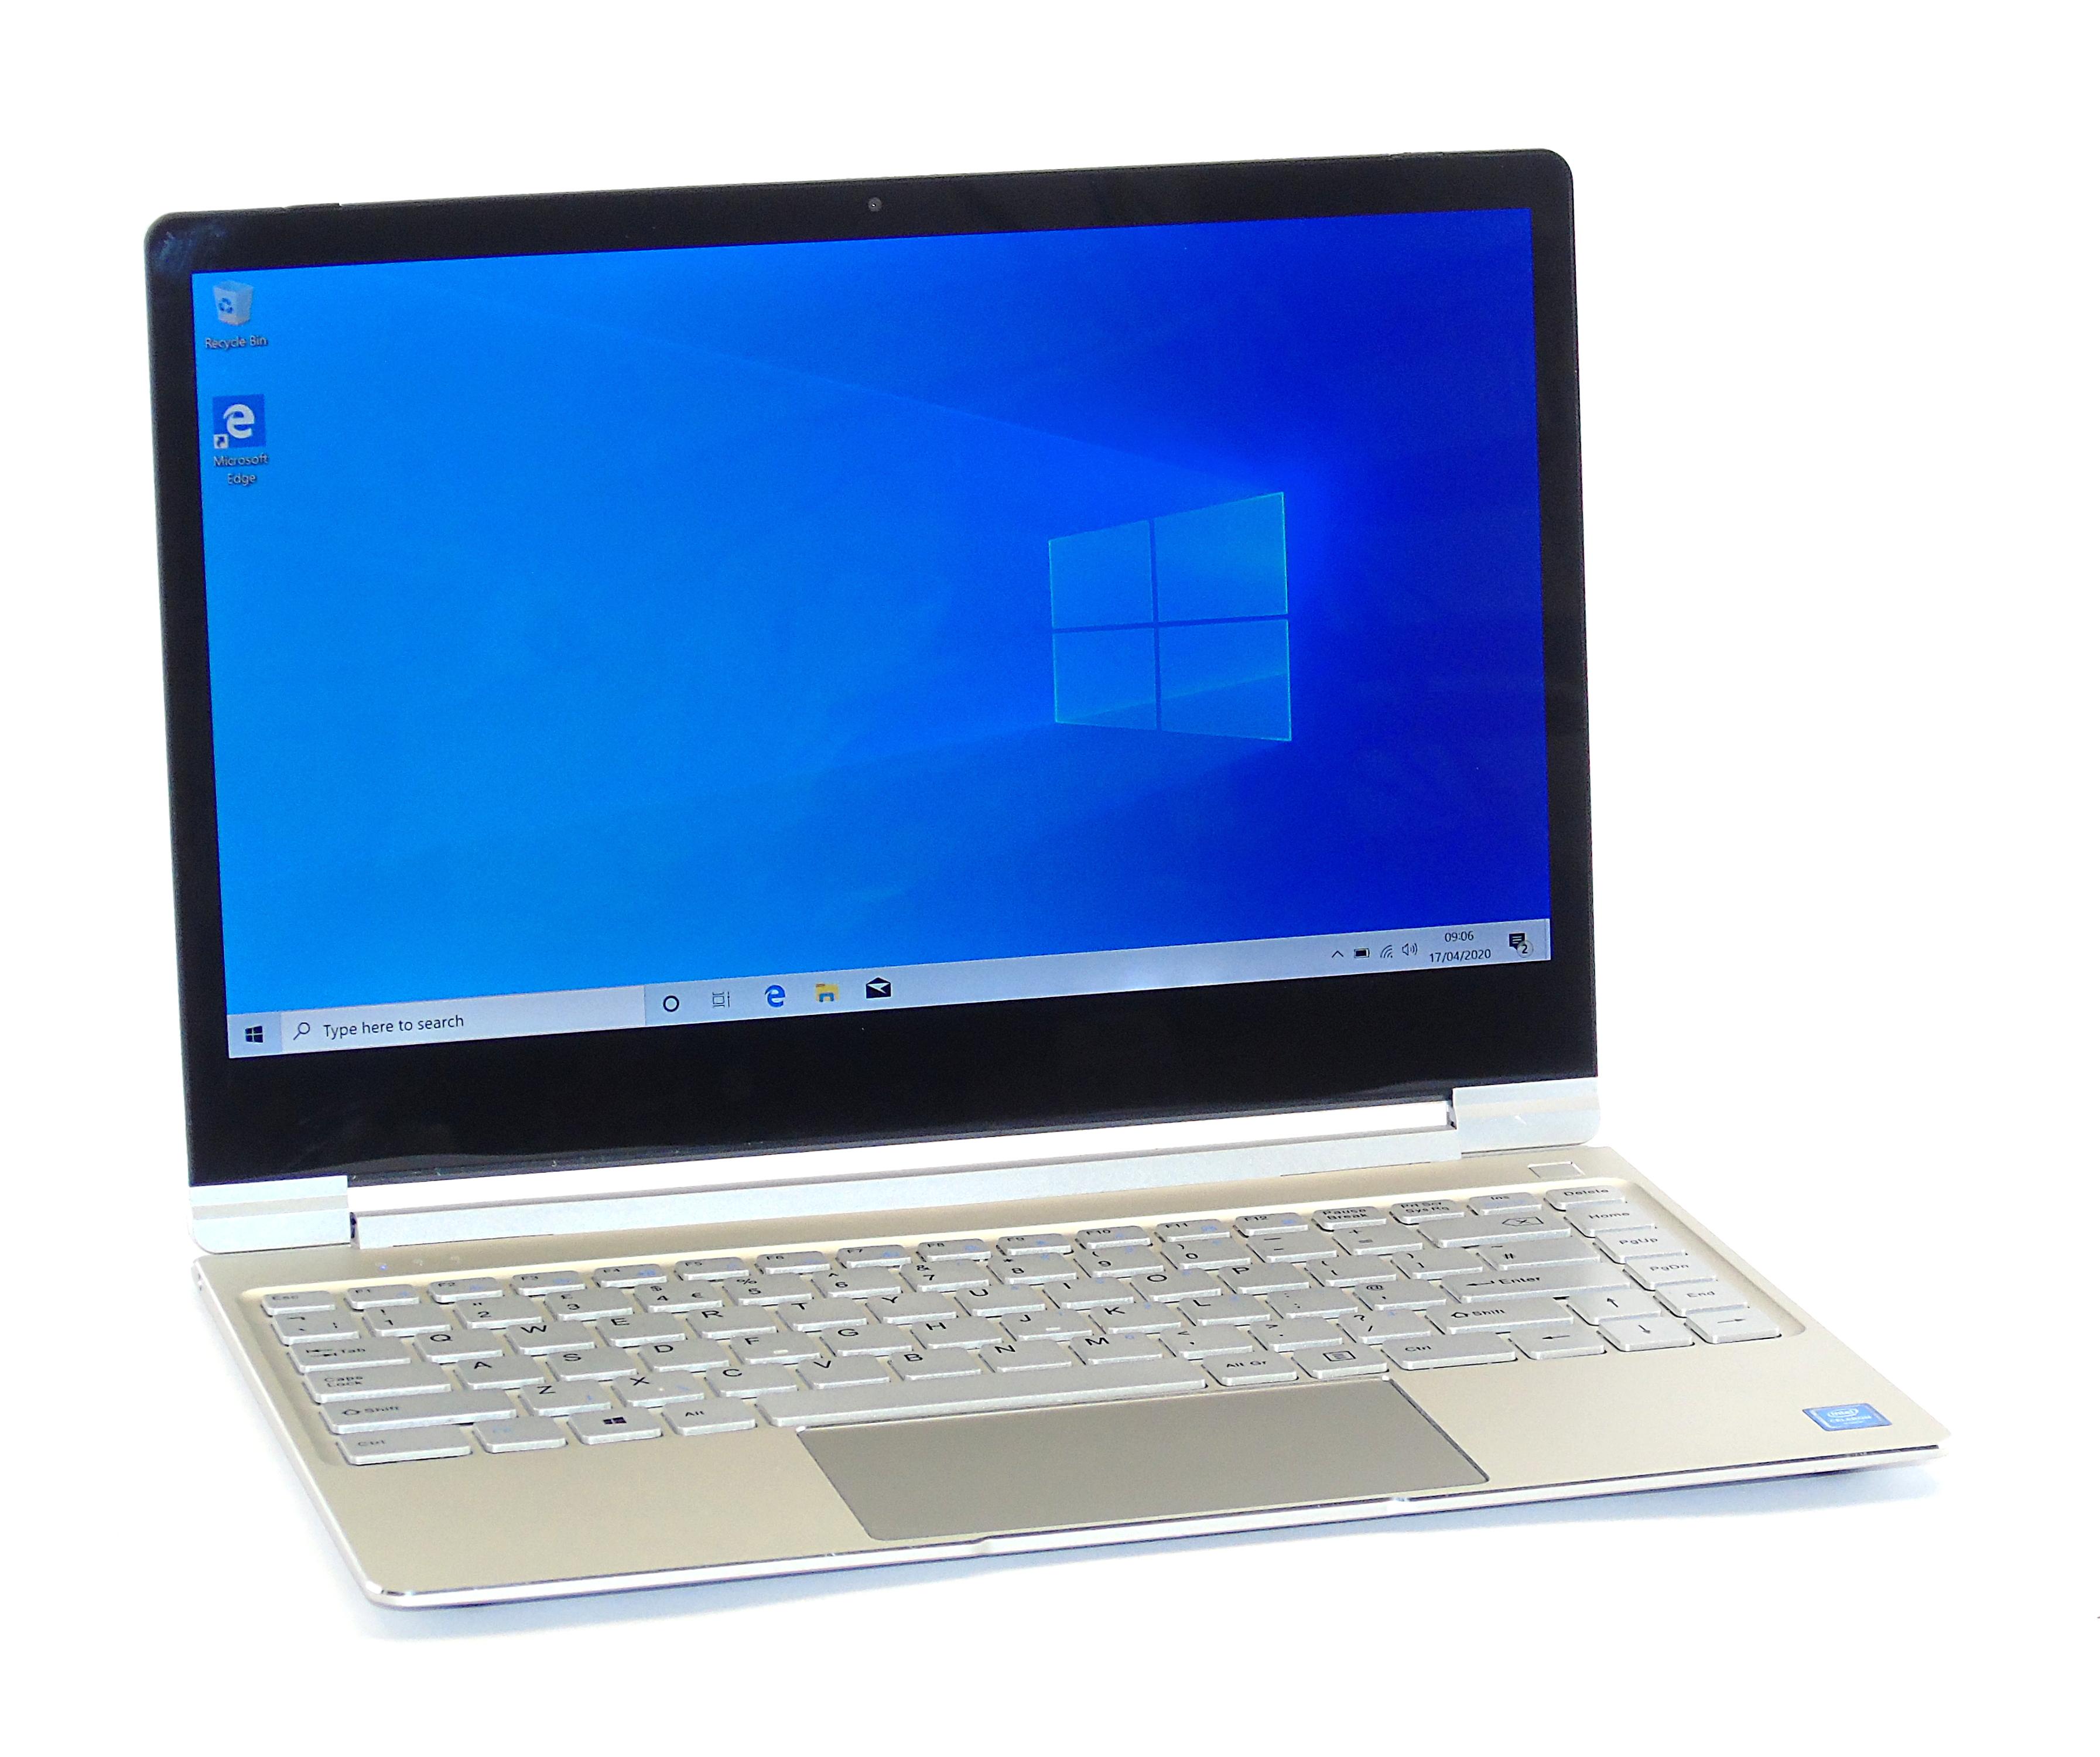 "GeoBook 3 Laptop Celeron 4GB RAM 32GB eMMC 13.3"" Display Windows 10"